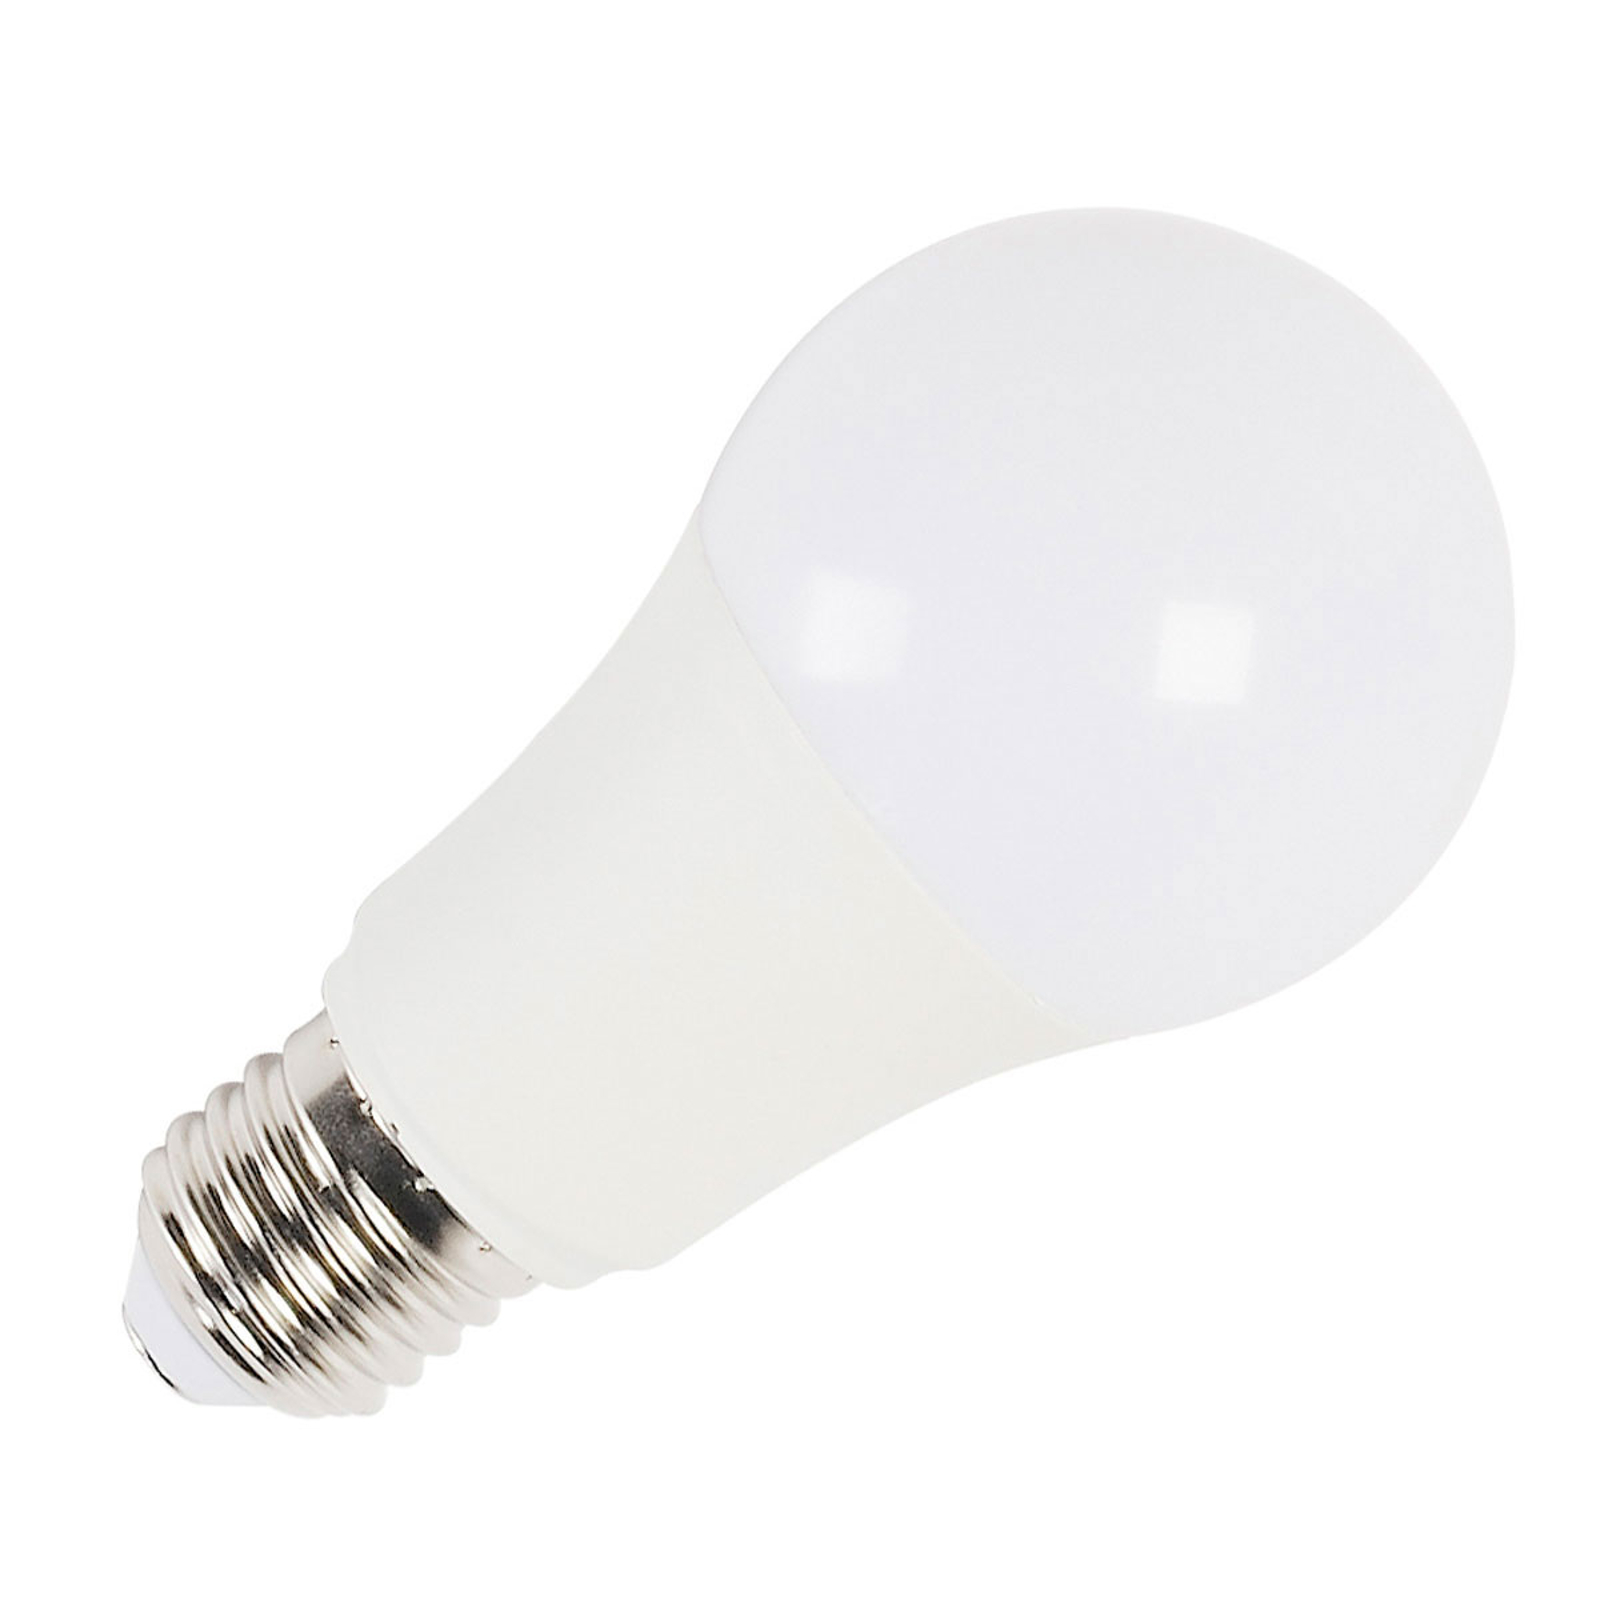 SLV VALETO LED-pære E27 A60 9,5W RGBW 806lm